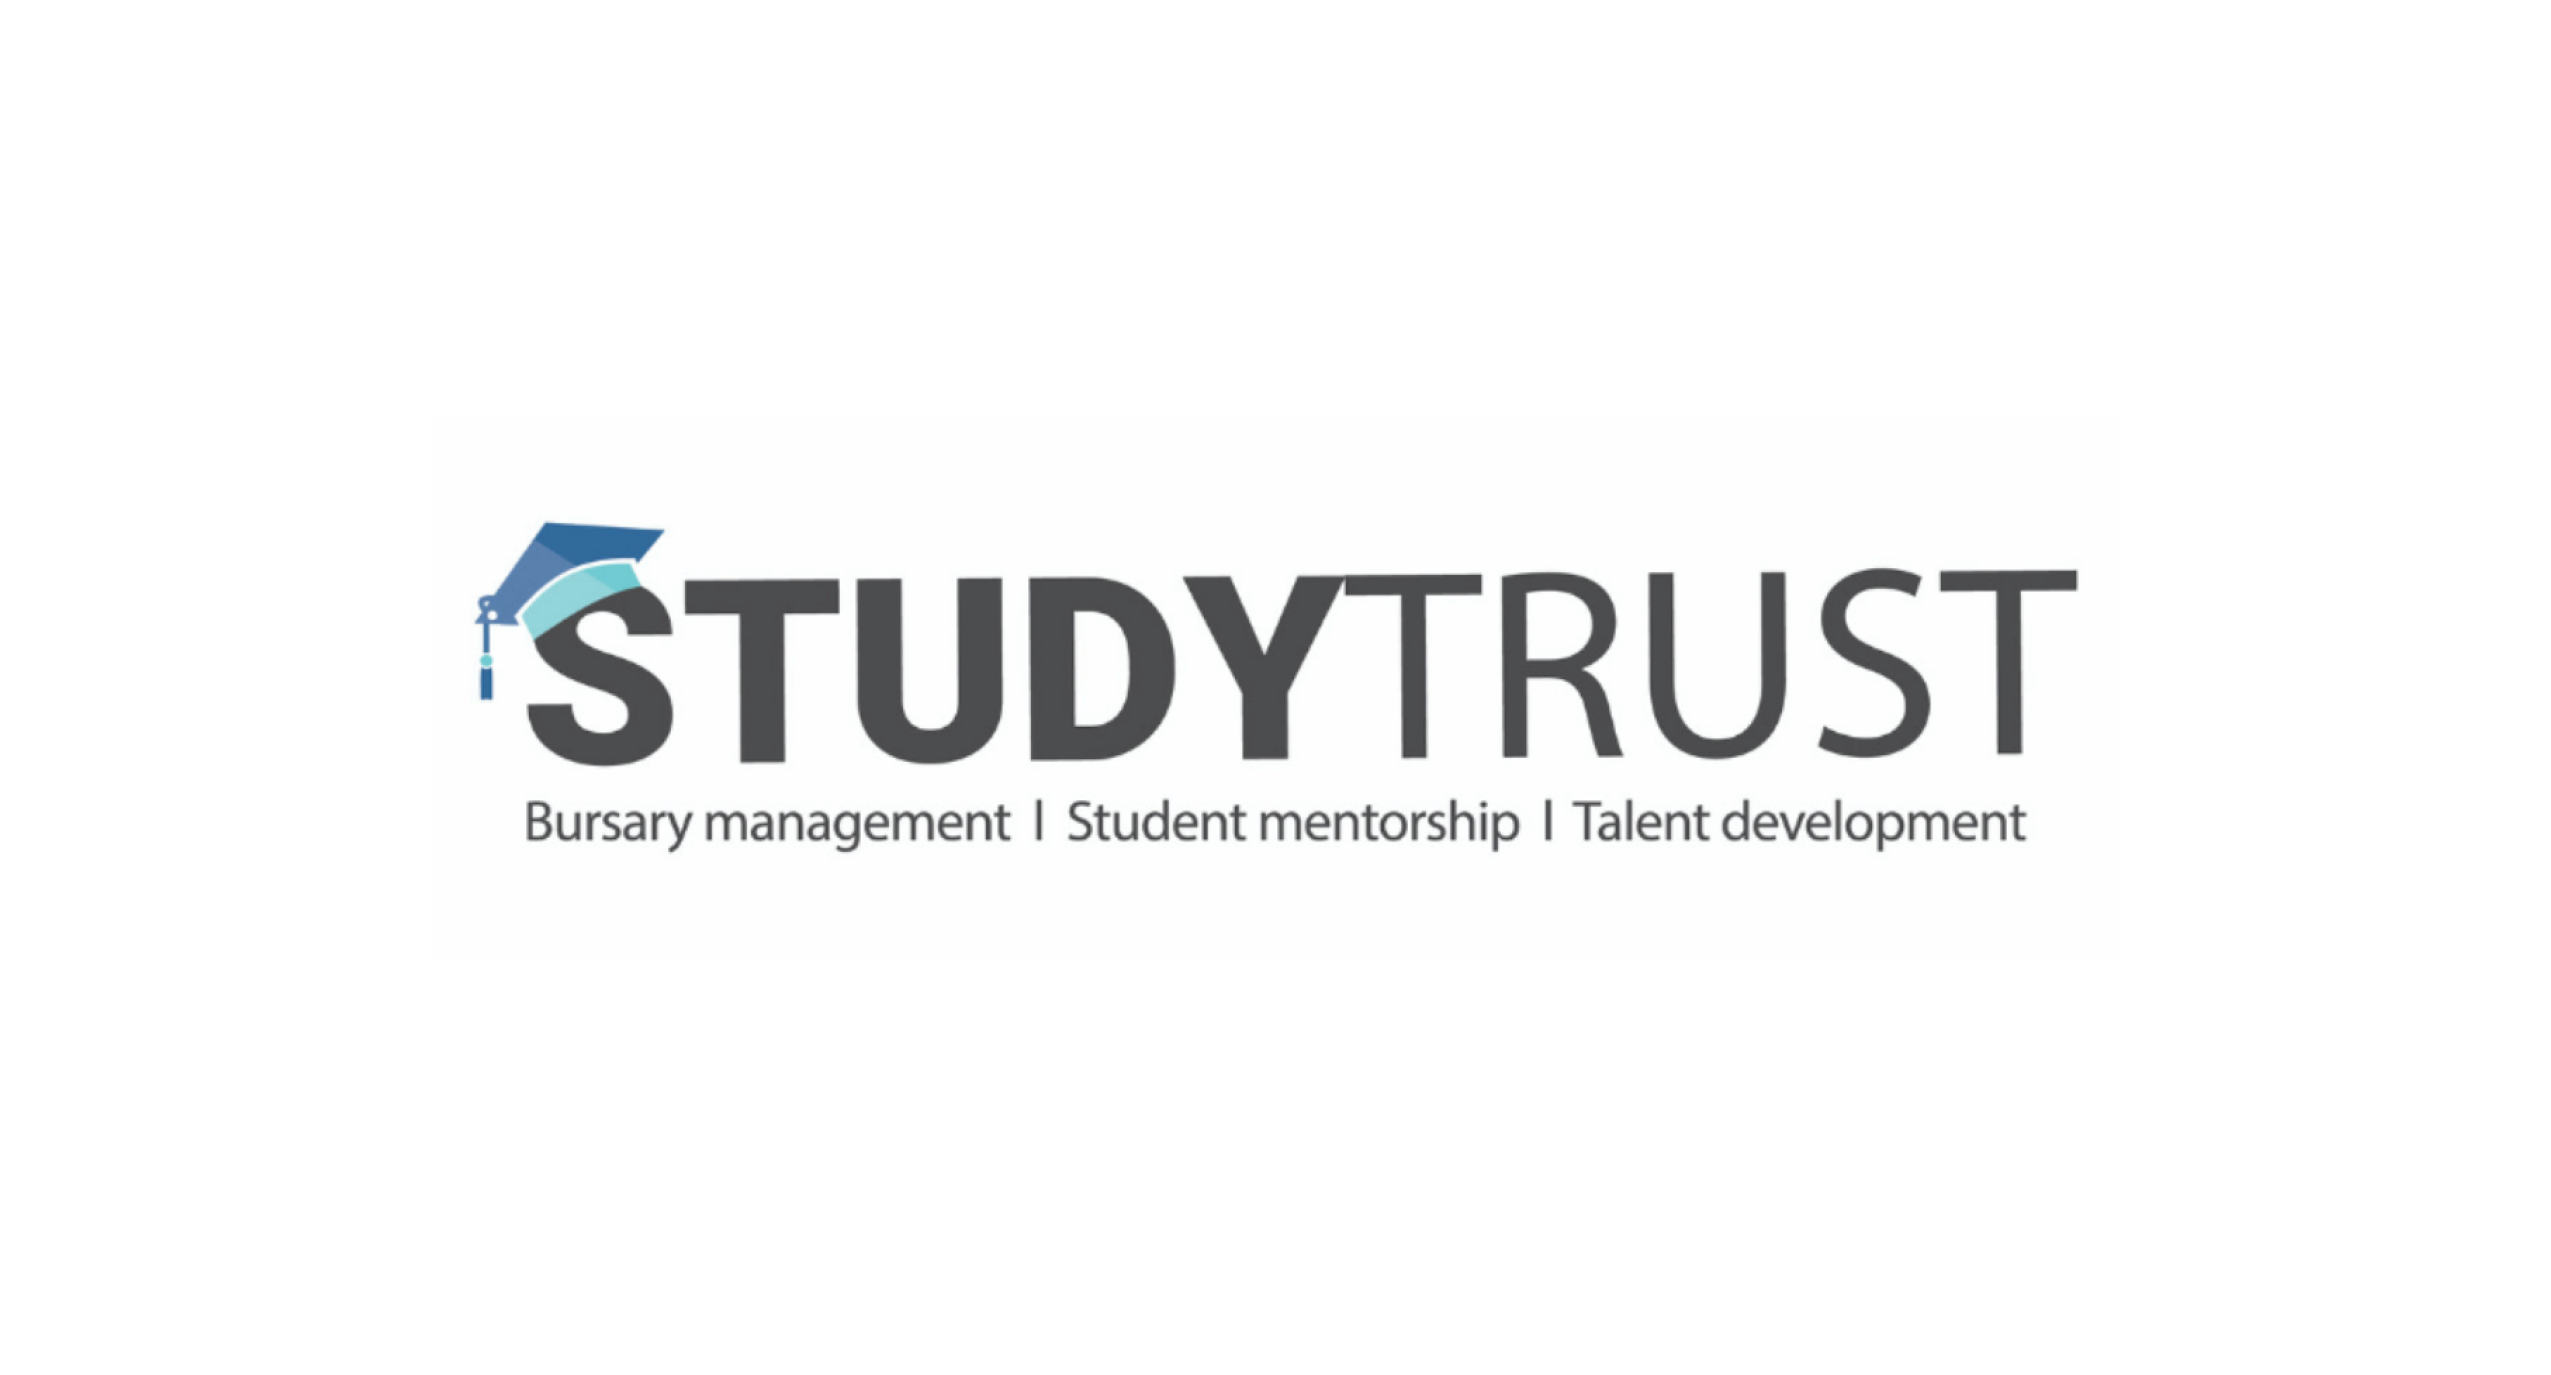 StudyTrust Bursary management student mentorship talent development logo